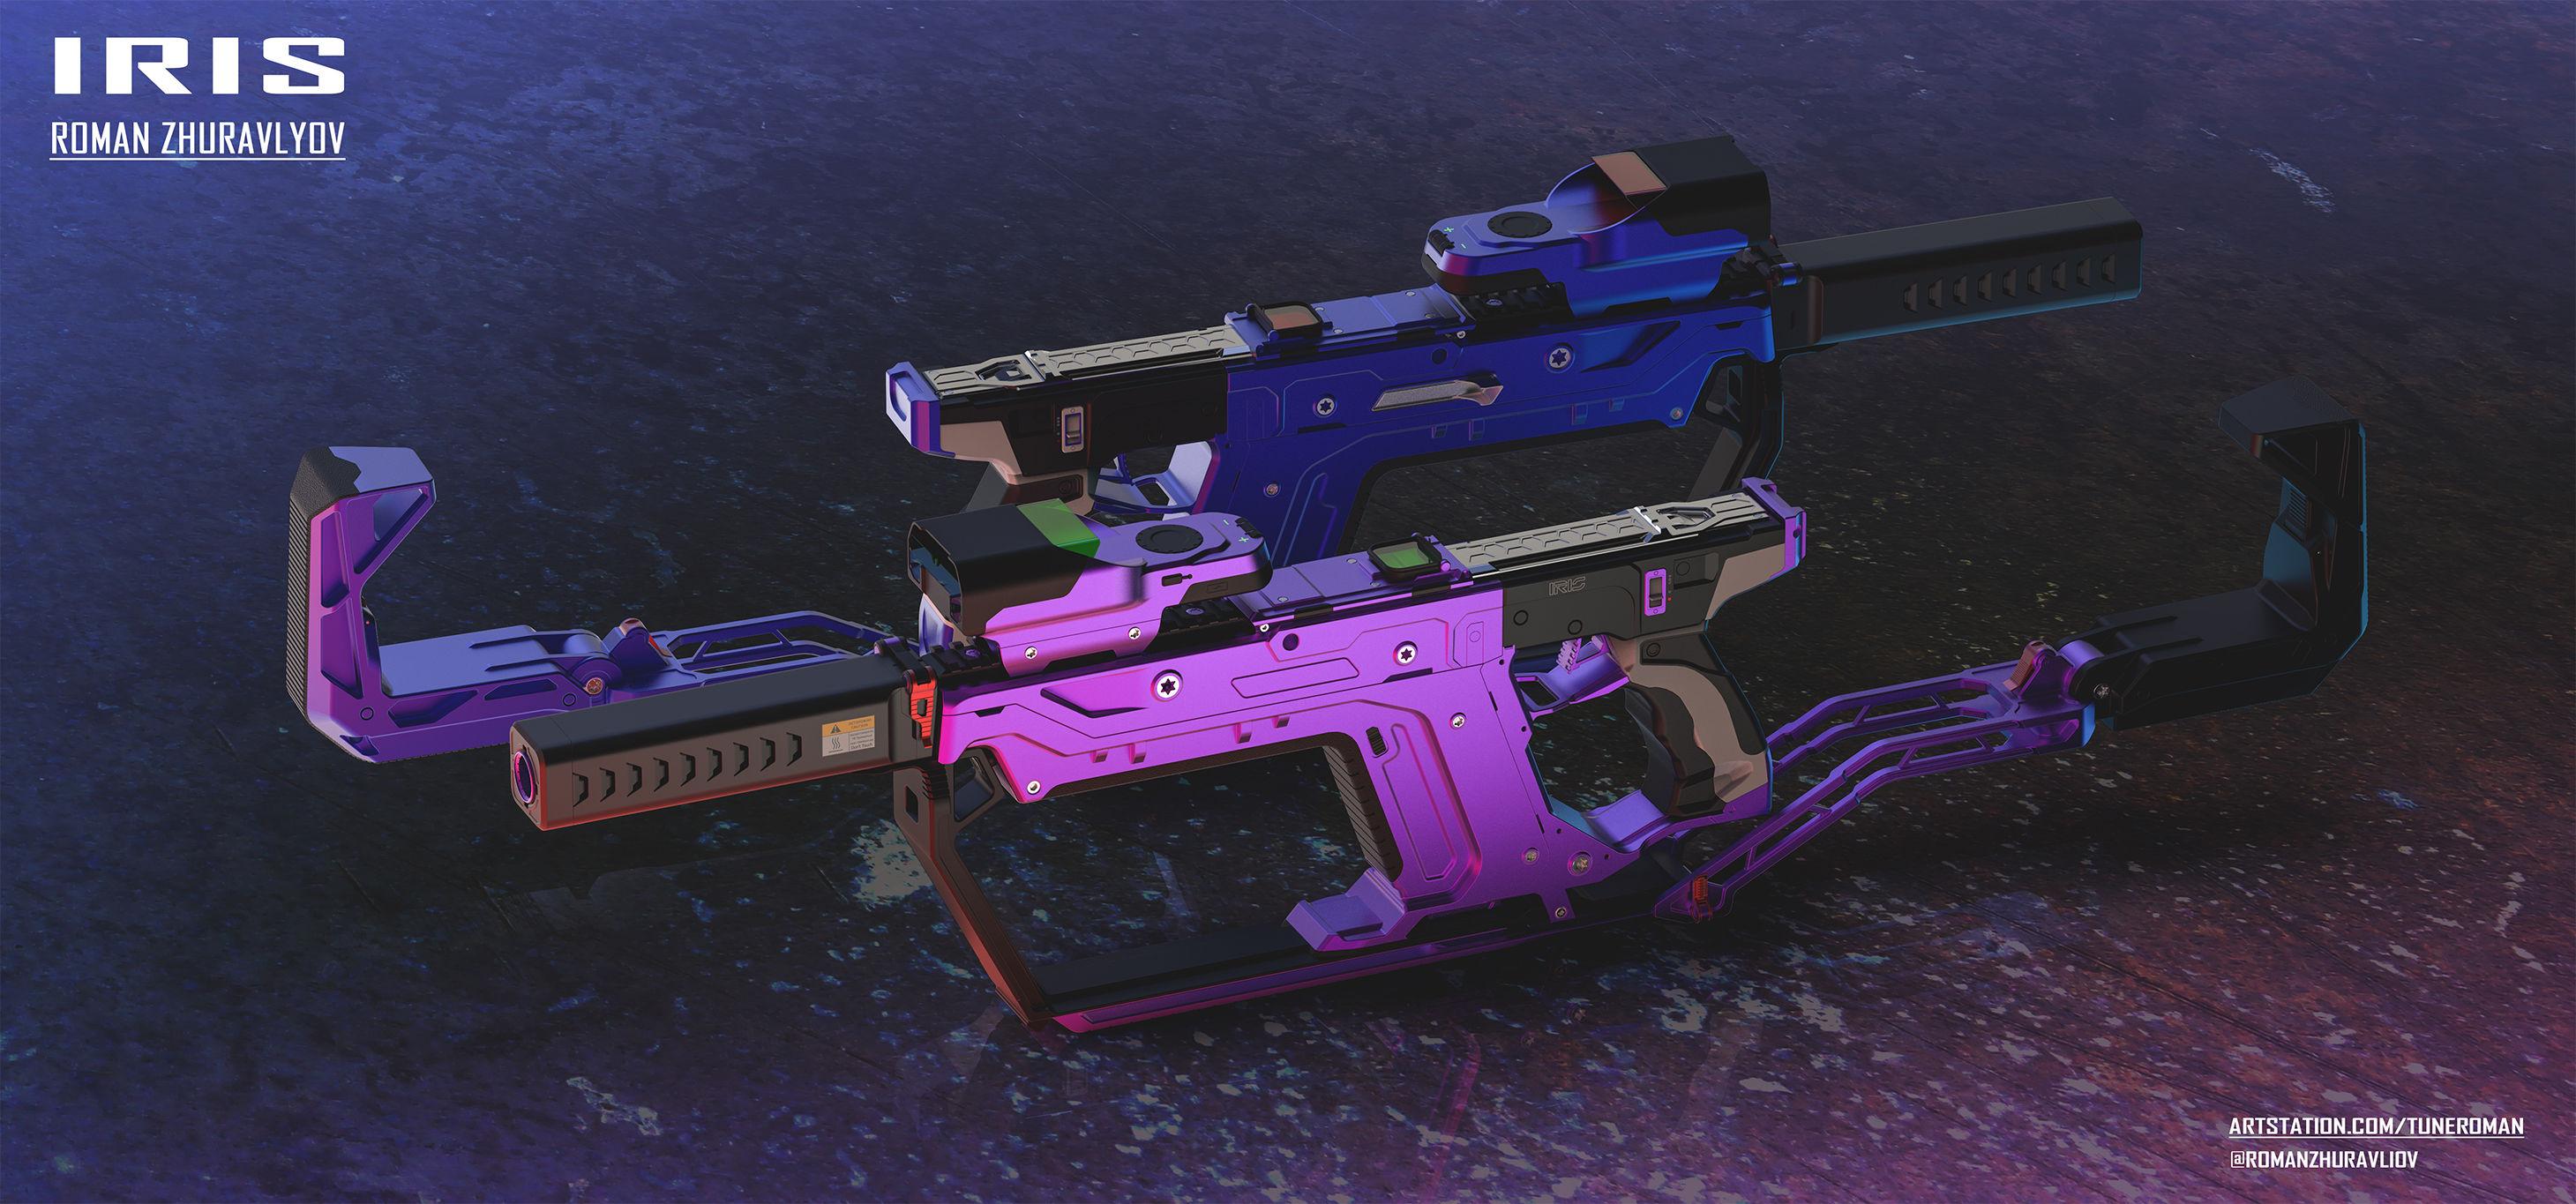 Iris-pp-3-2k-3500-3500